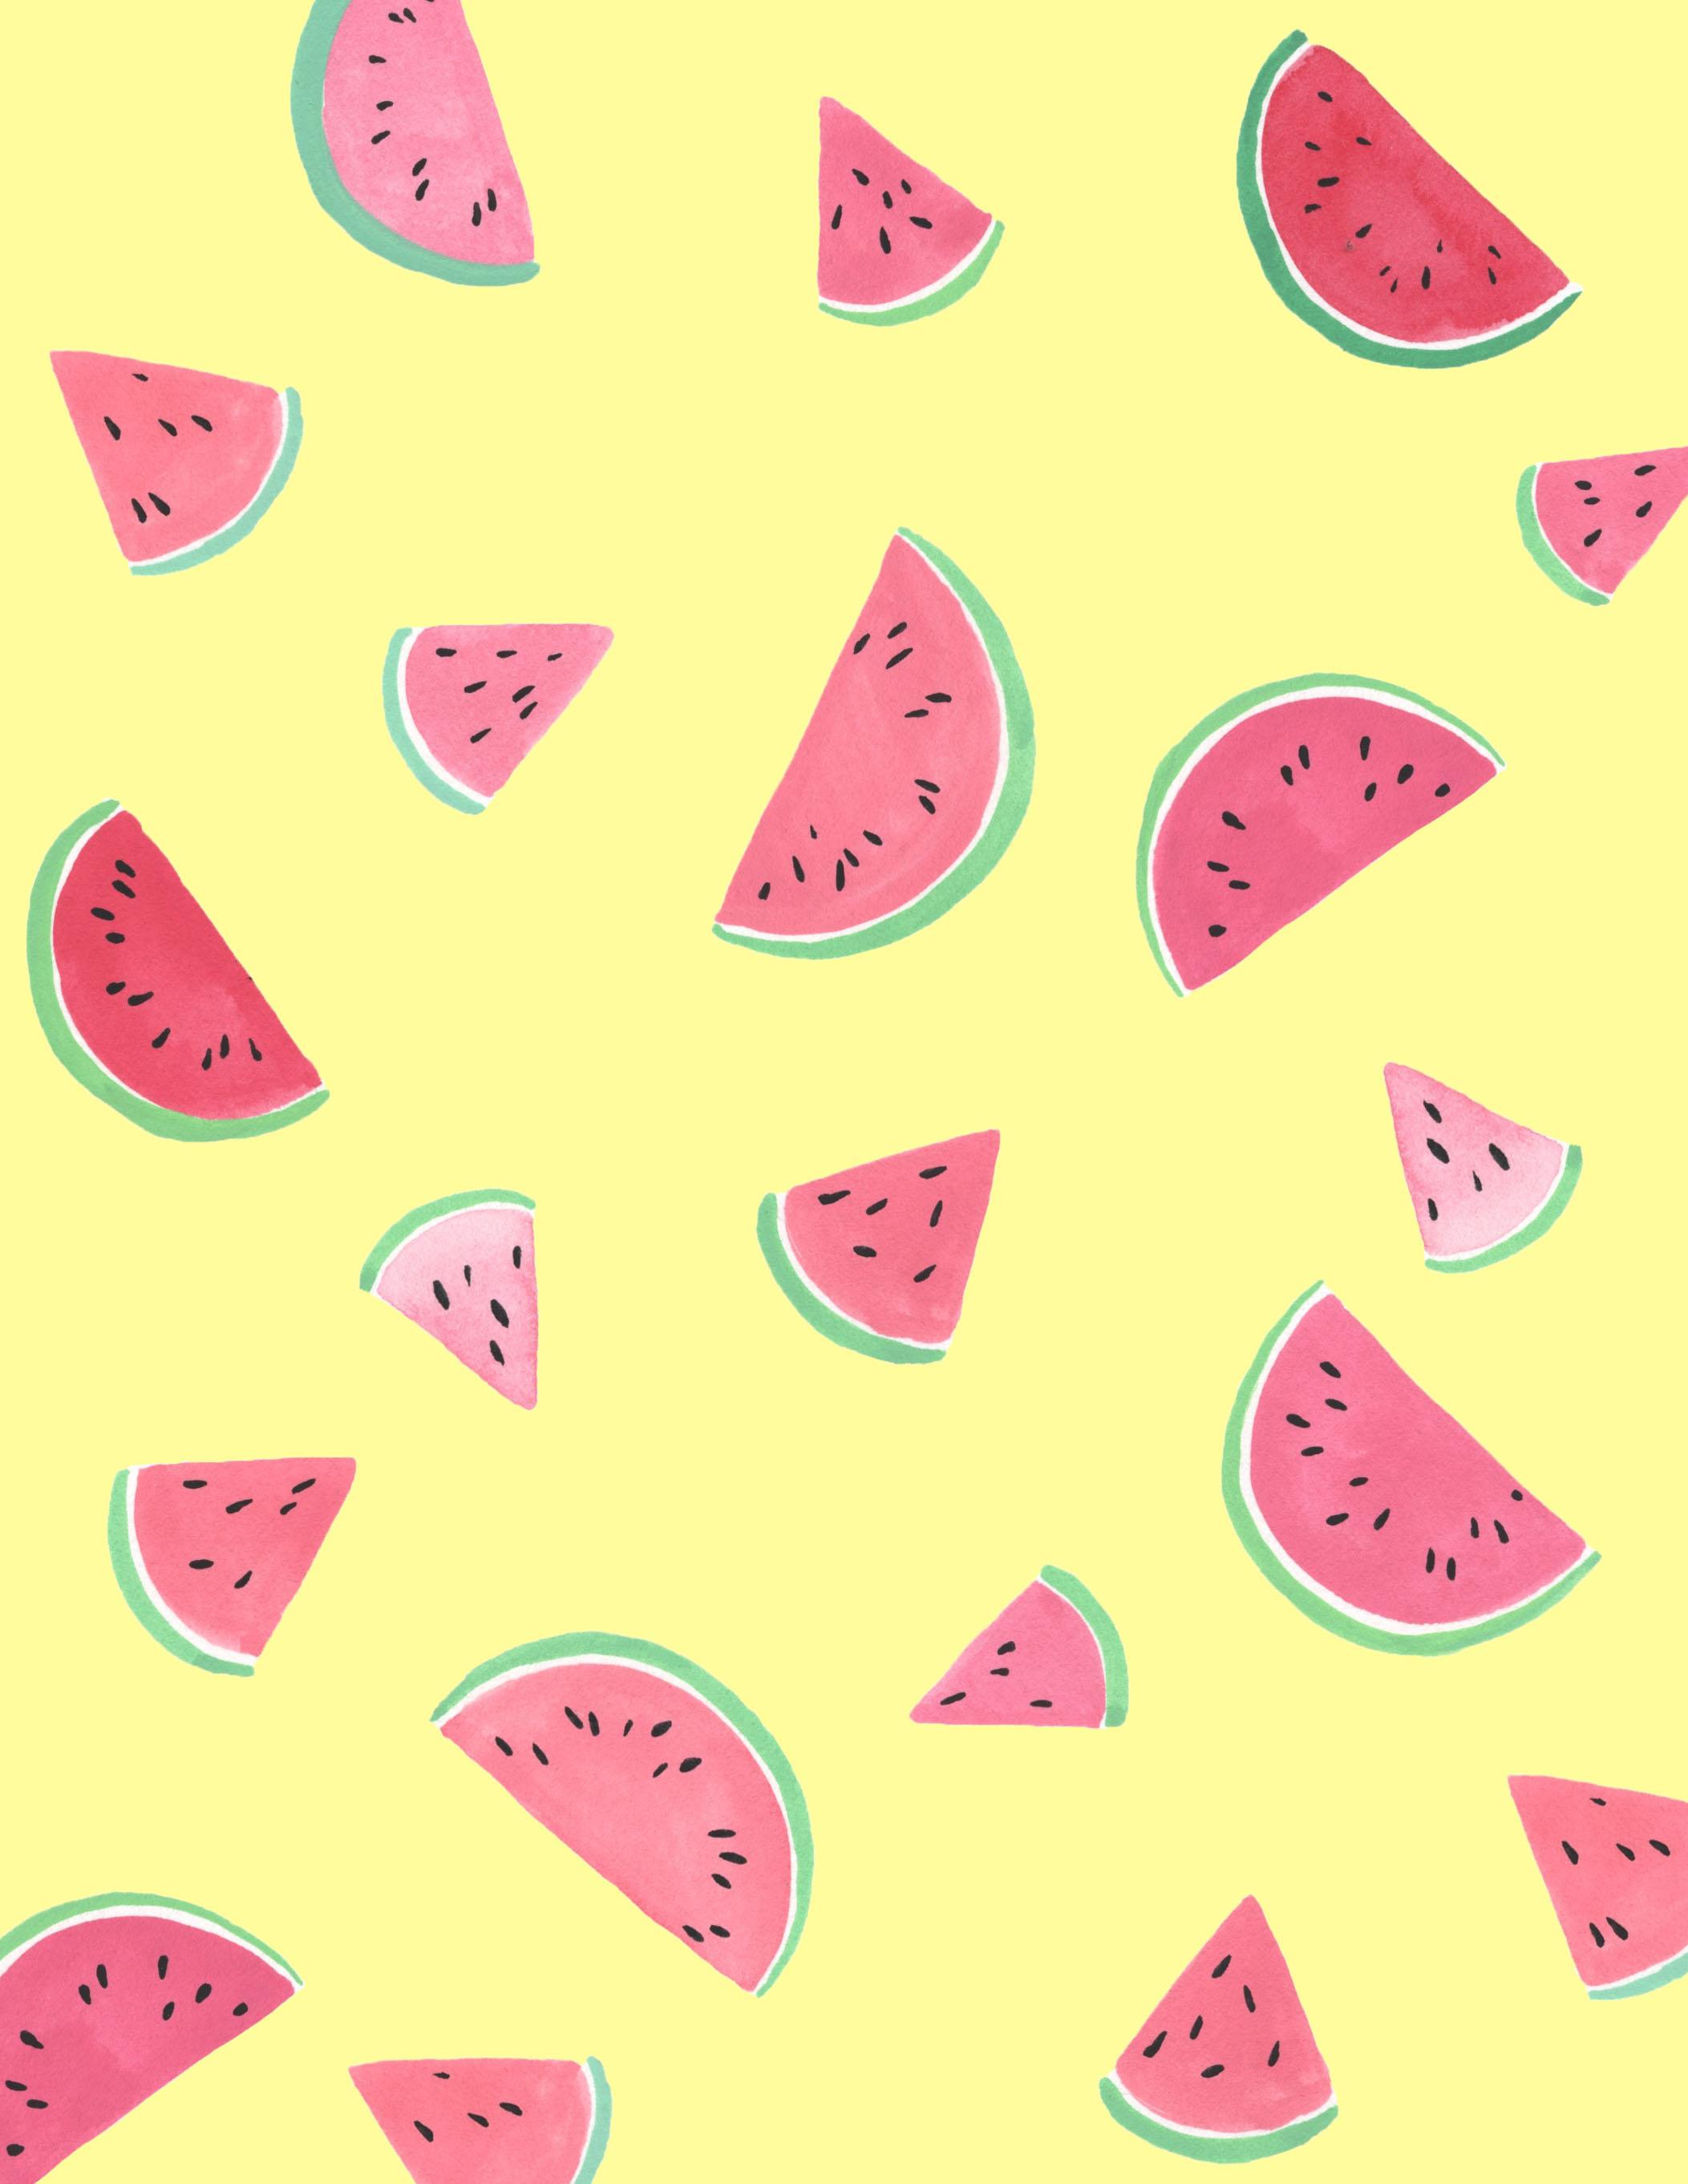 Cellrare-watermelon.jpg